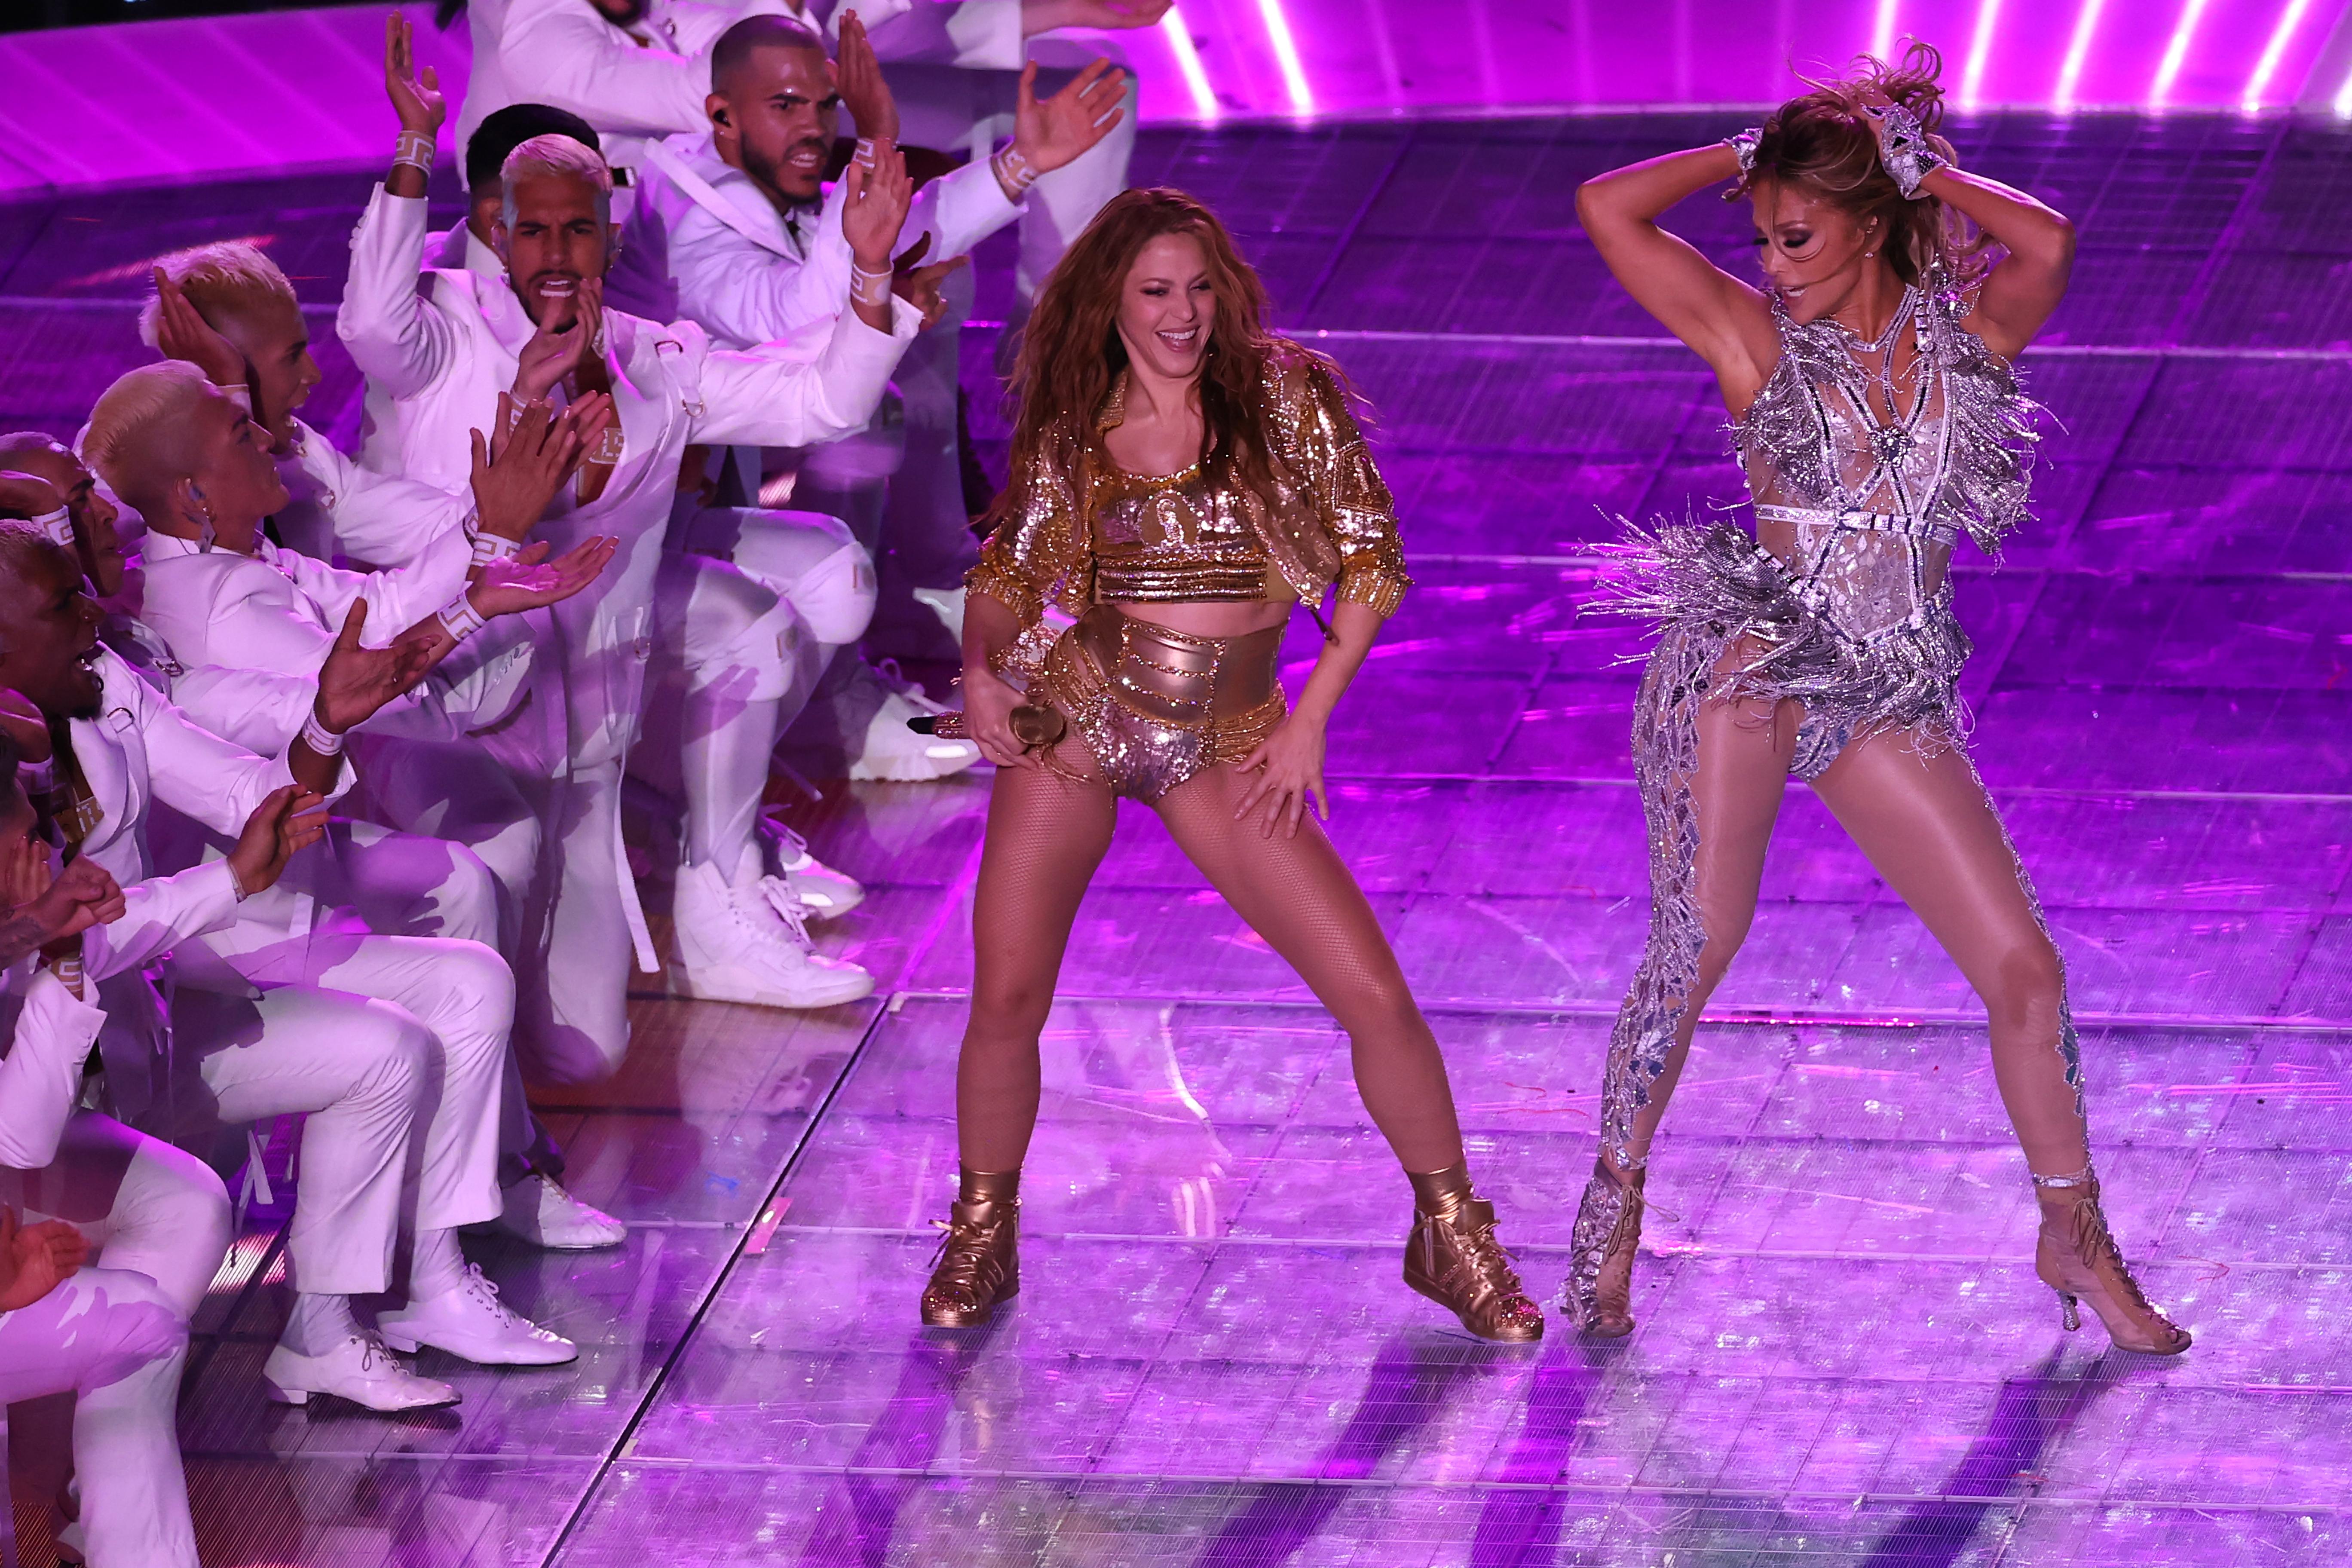 J Lo And Shakira Halftime Show A Ferocious Master Dance Class The Washington Post